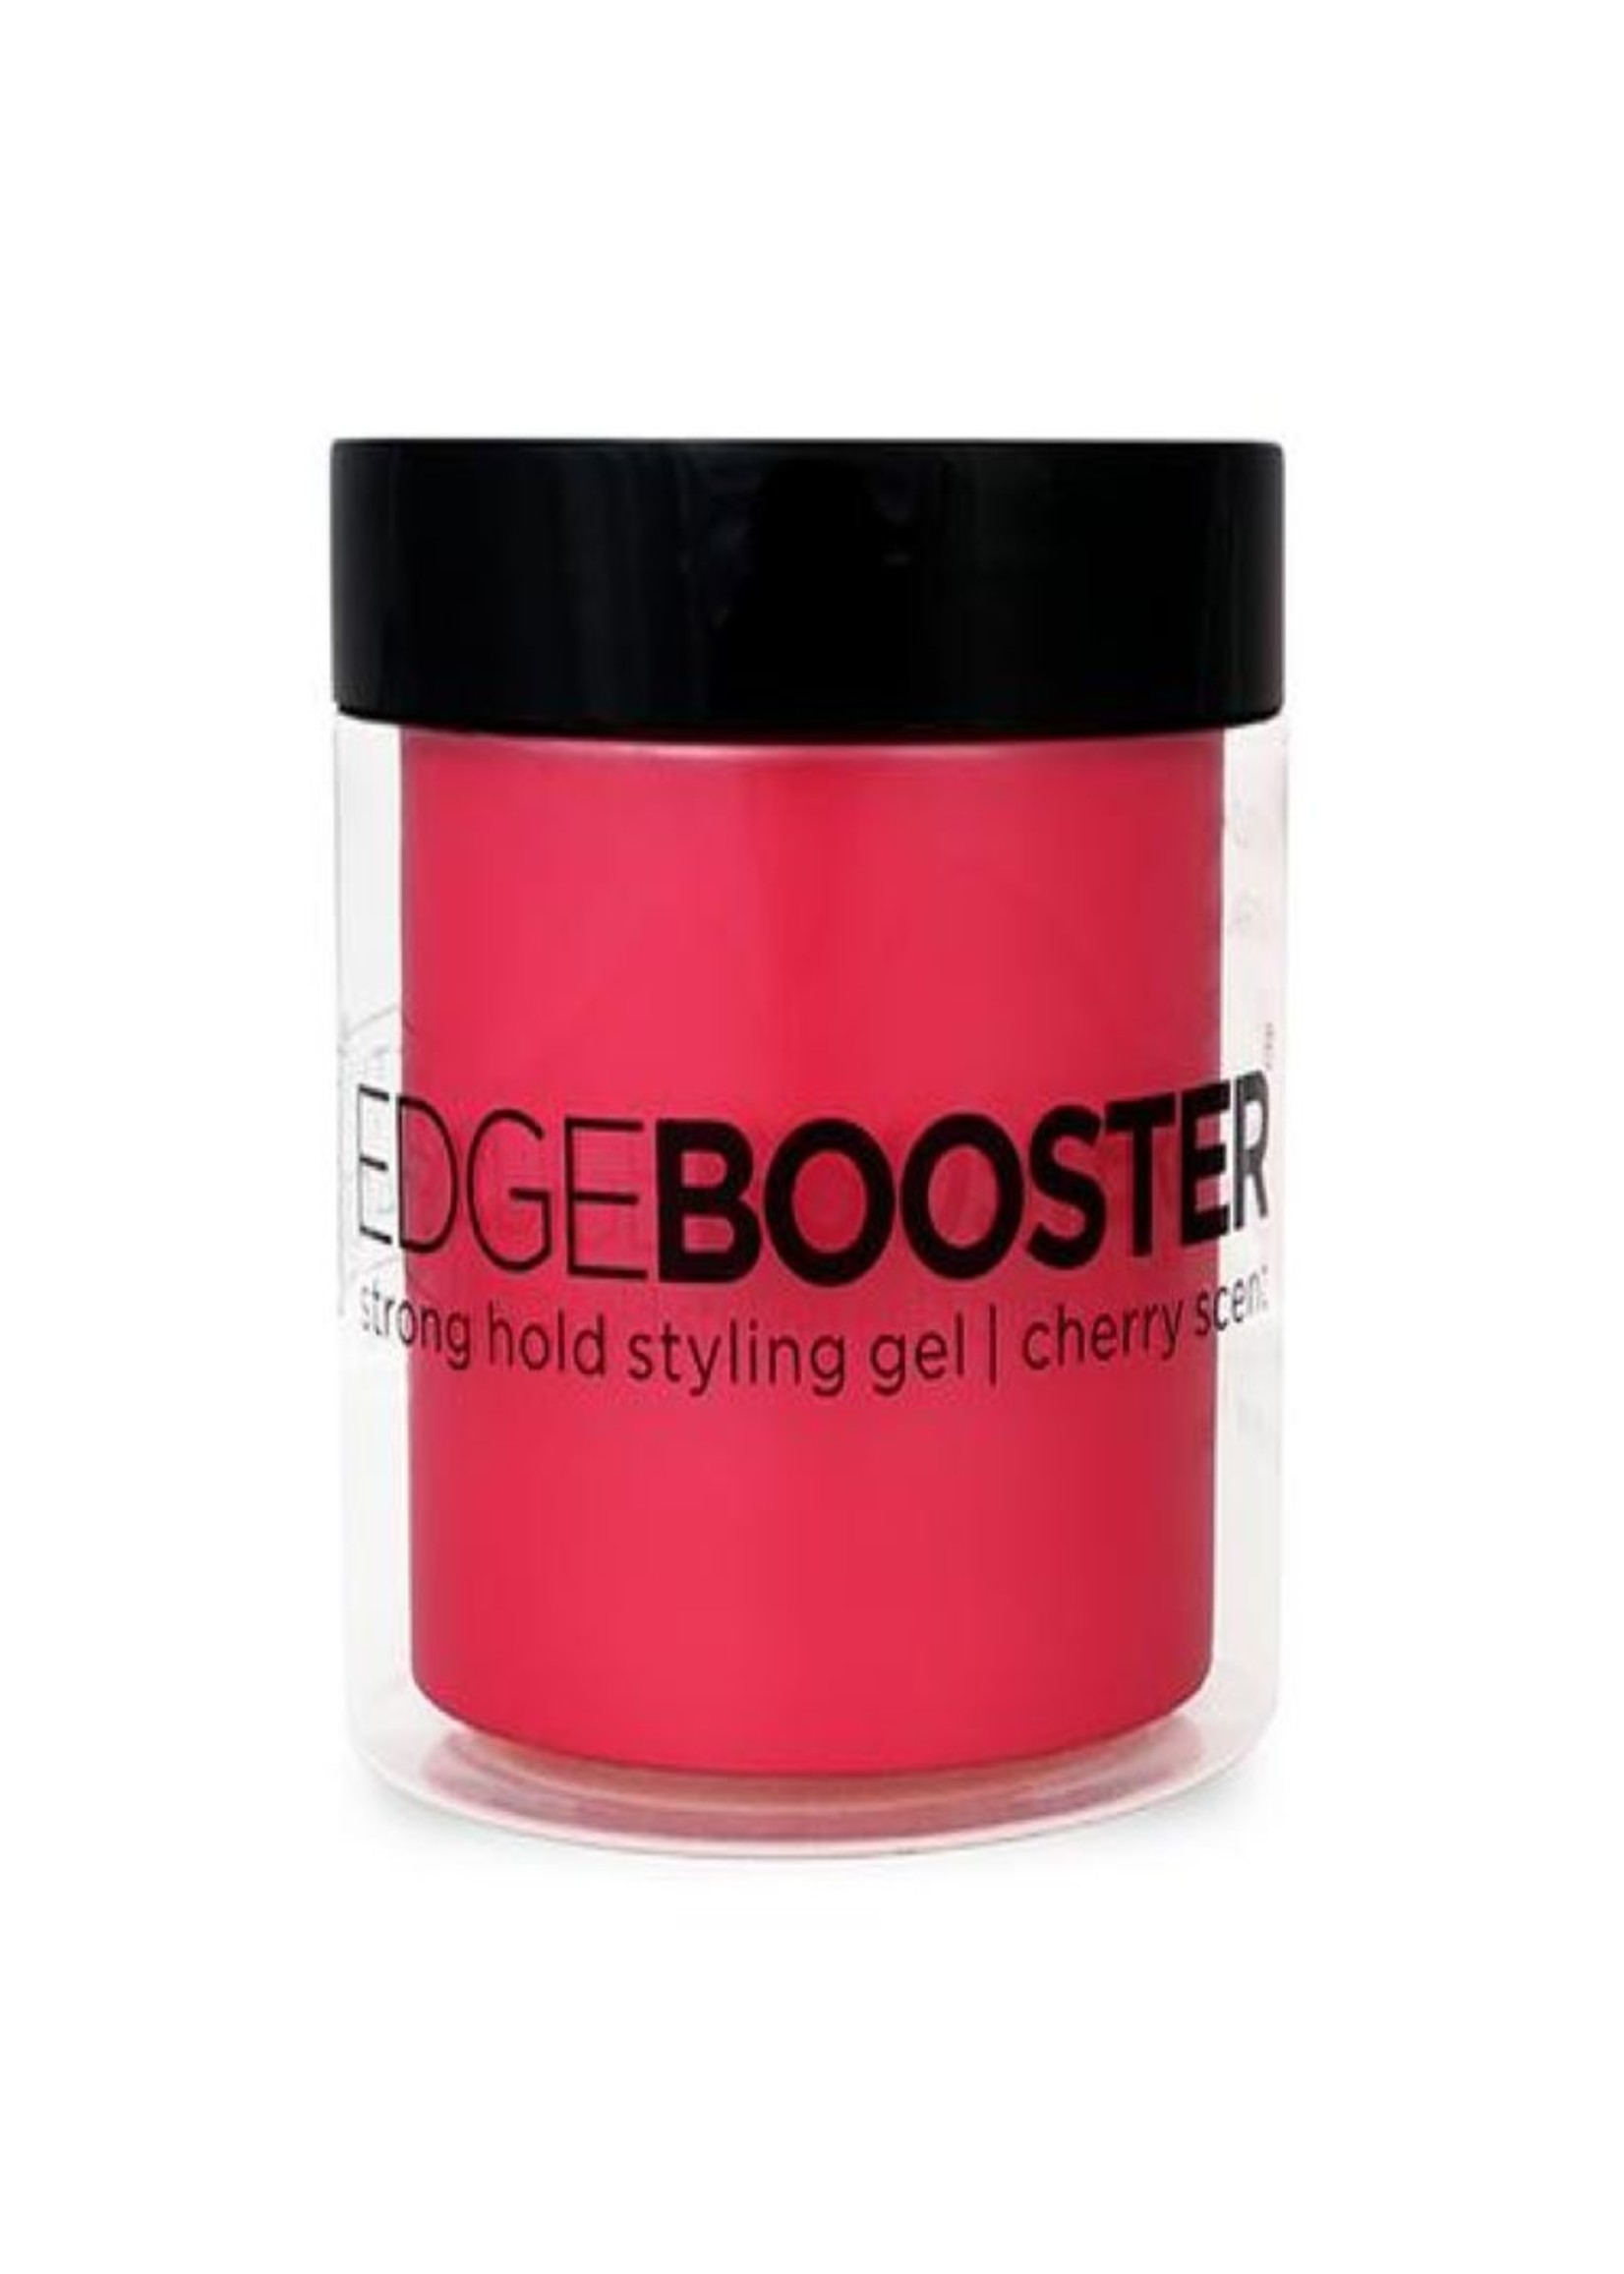 Edge Booster Cherry 9.46oz